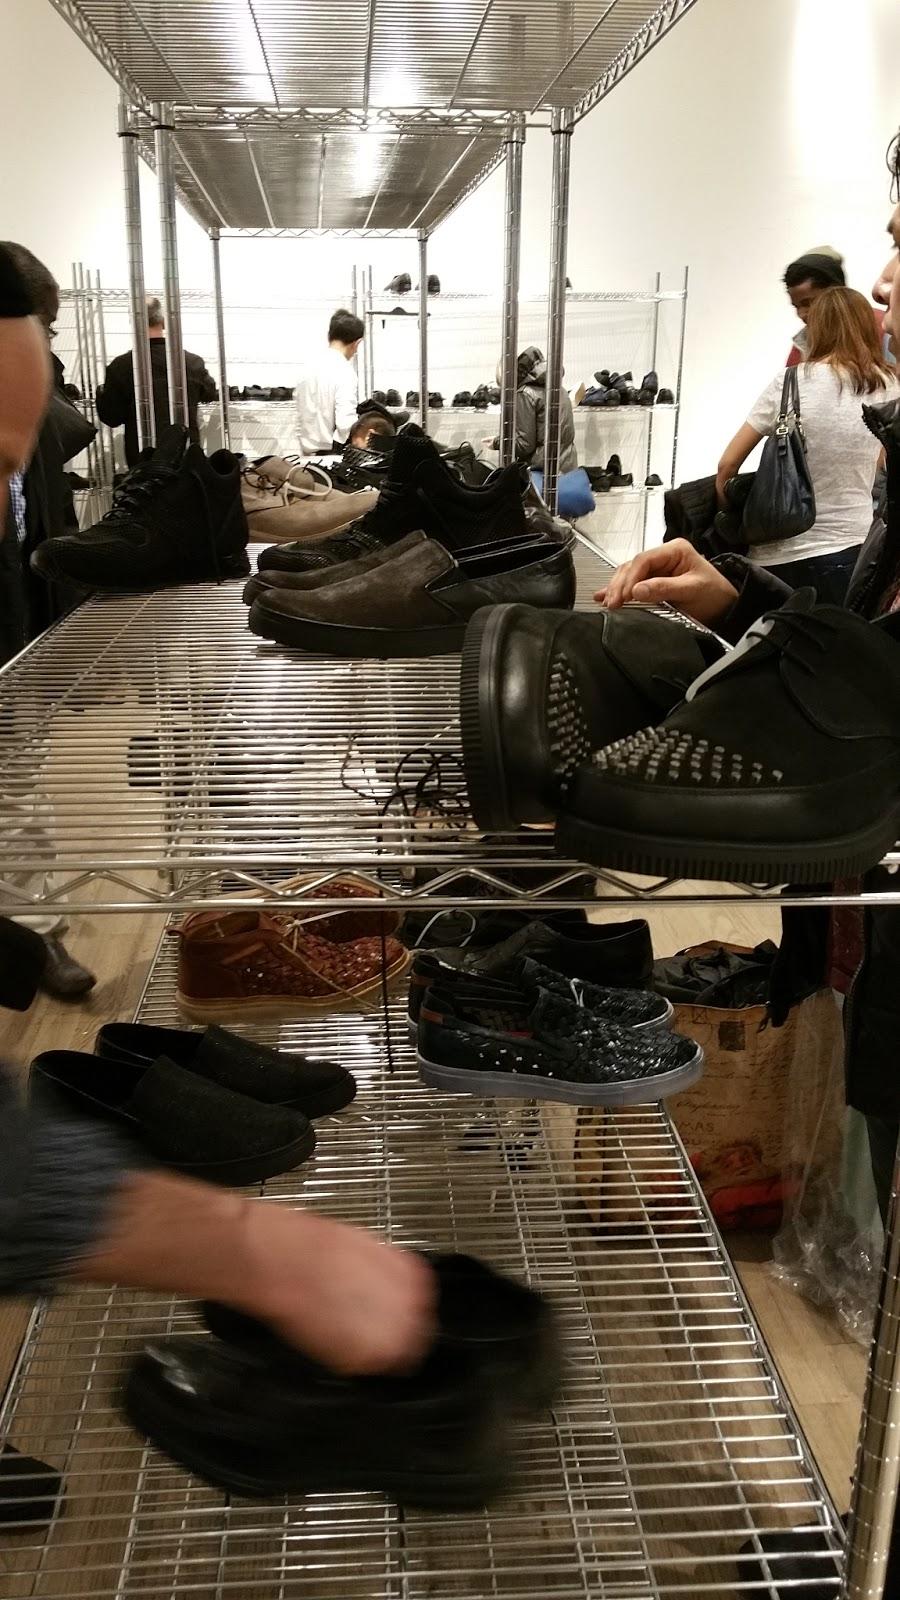 asics shoes reddit news fails twerking santa claus 668033